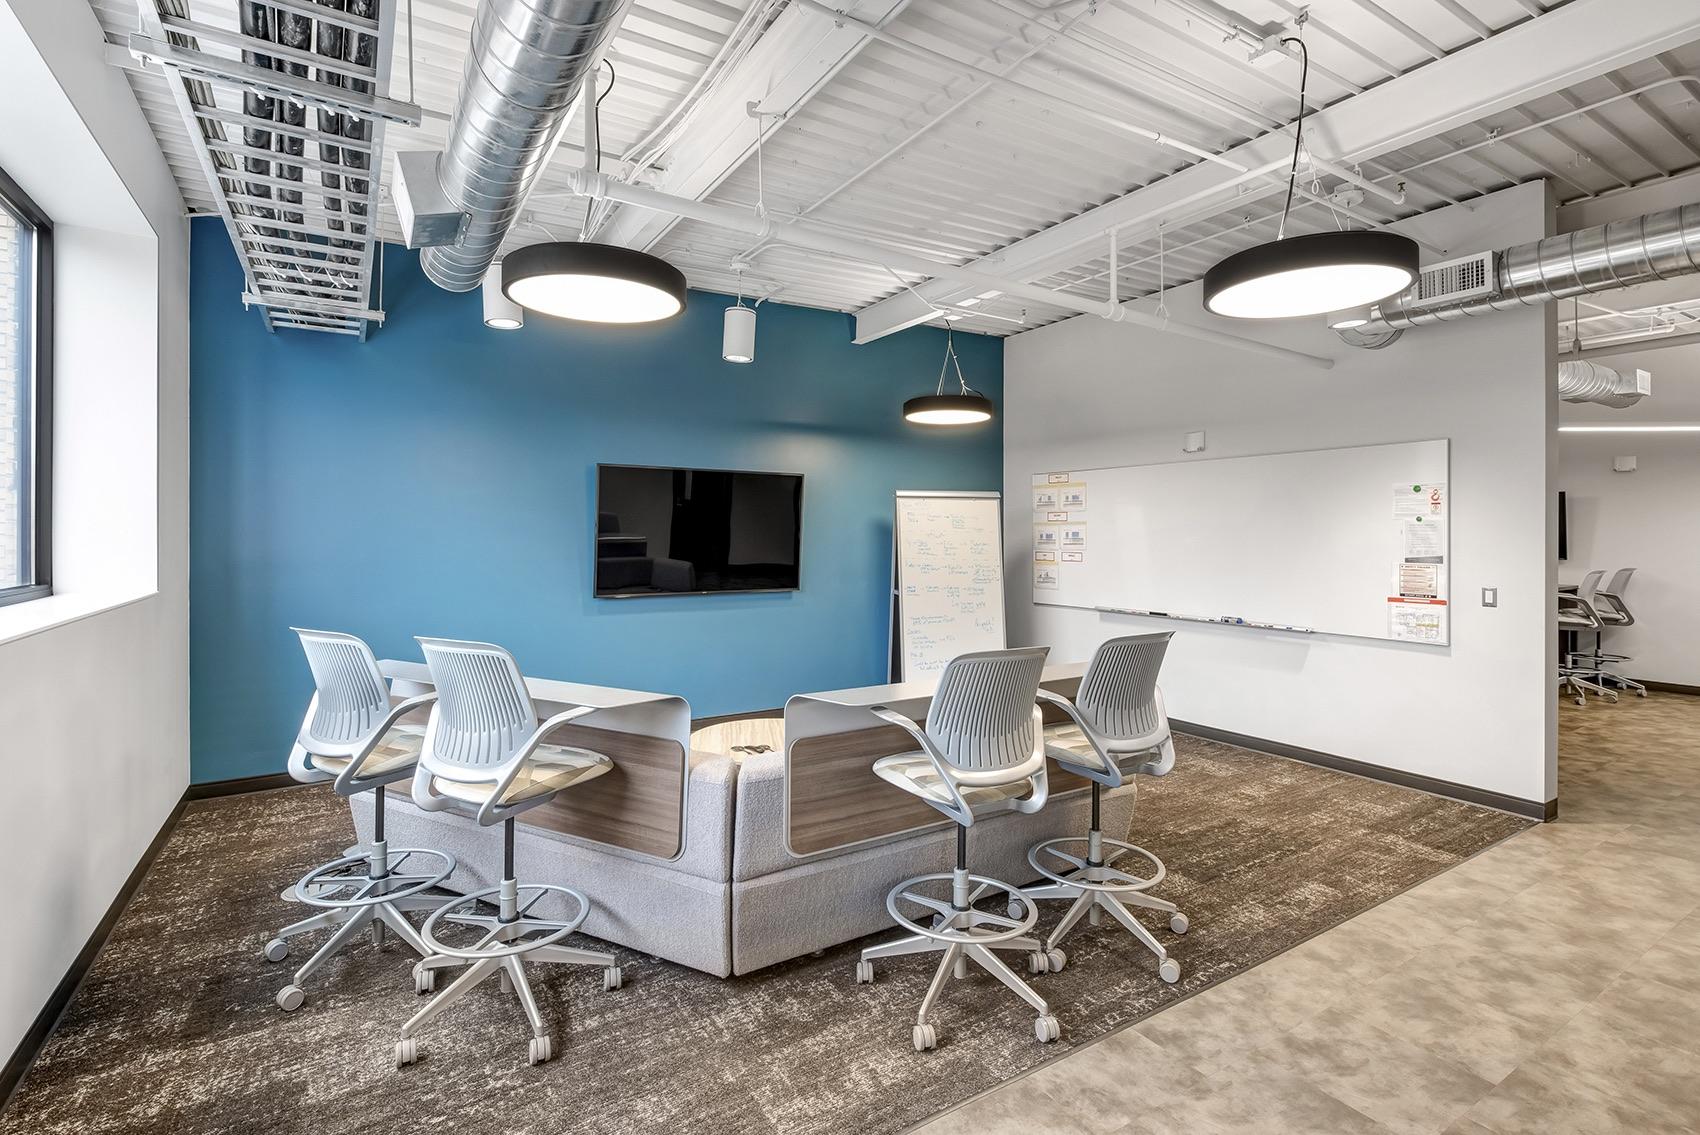 detroit-diesel-office-3